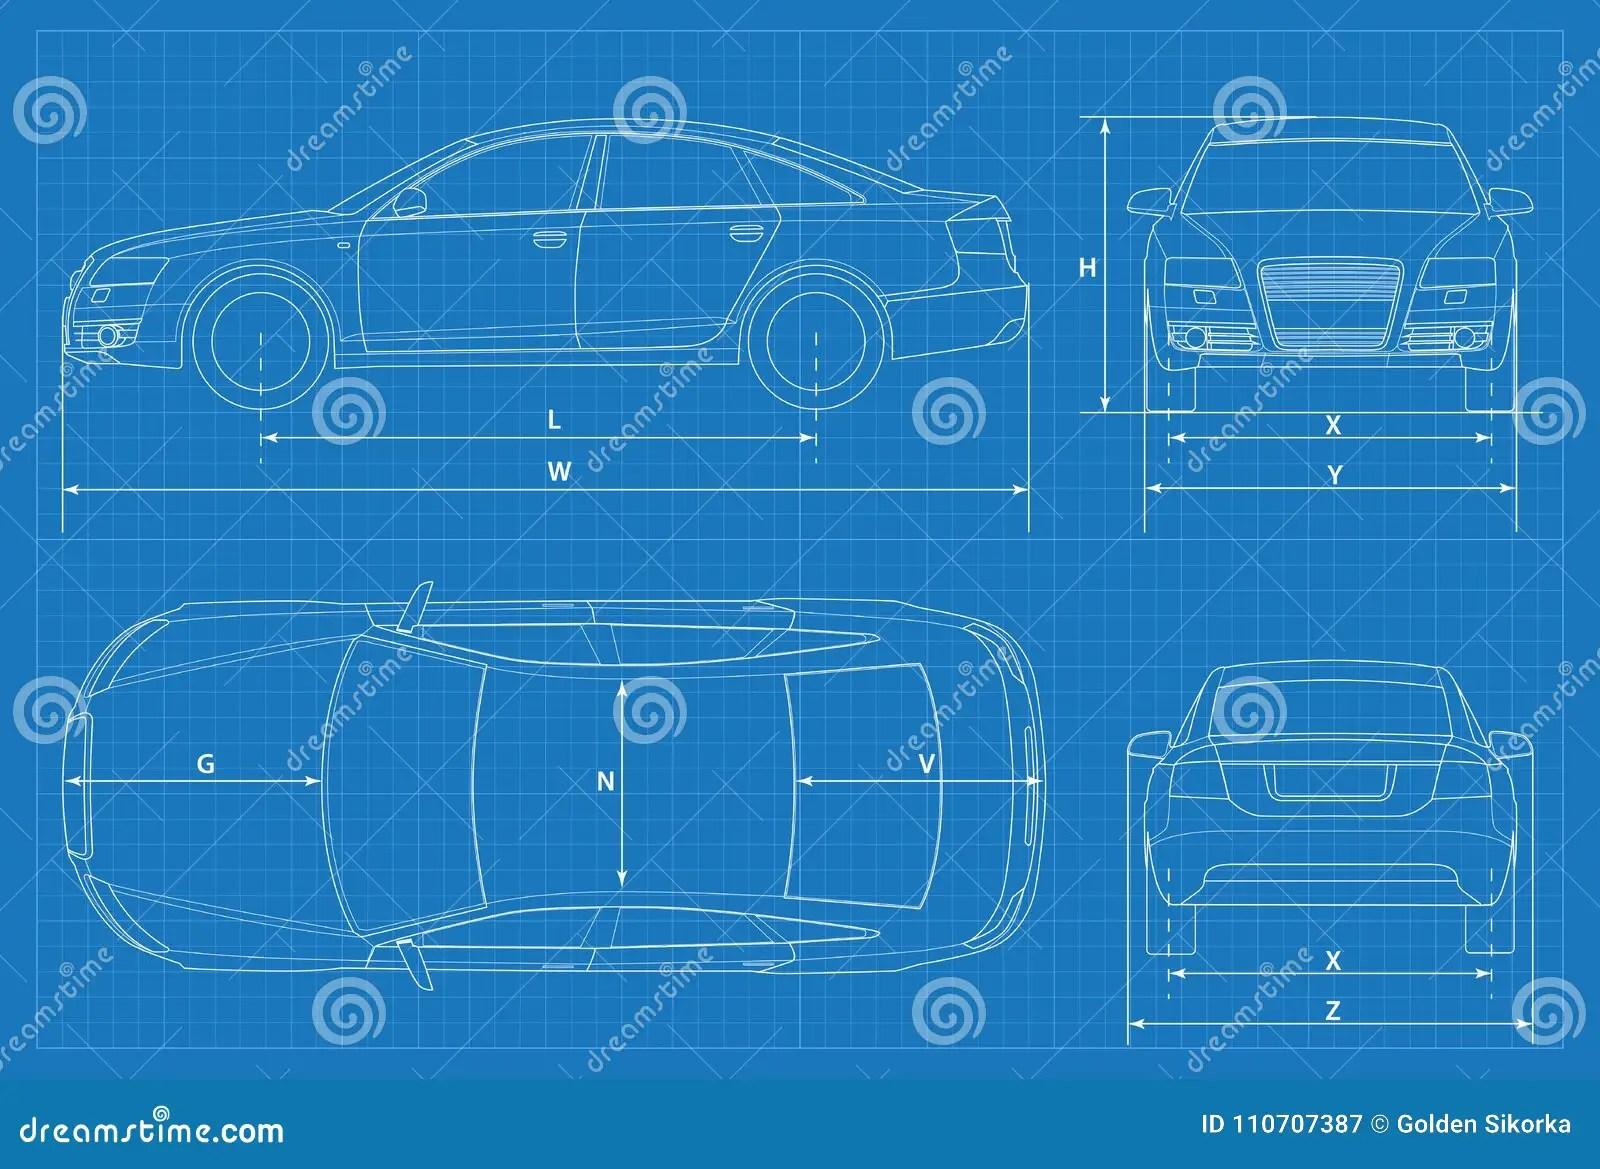 hight resolution of car schematic or car blueprint vector illustration sedan car in outline business sedan